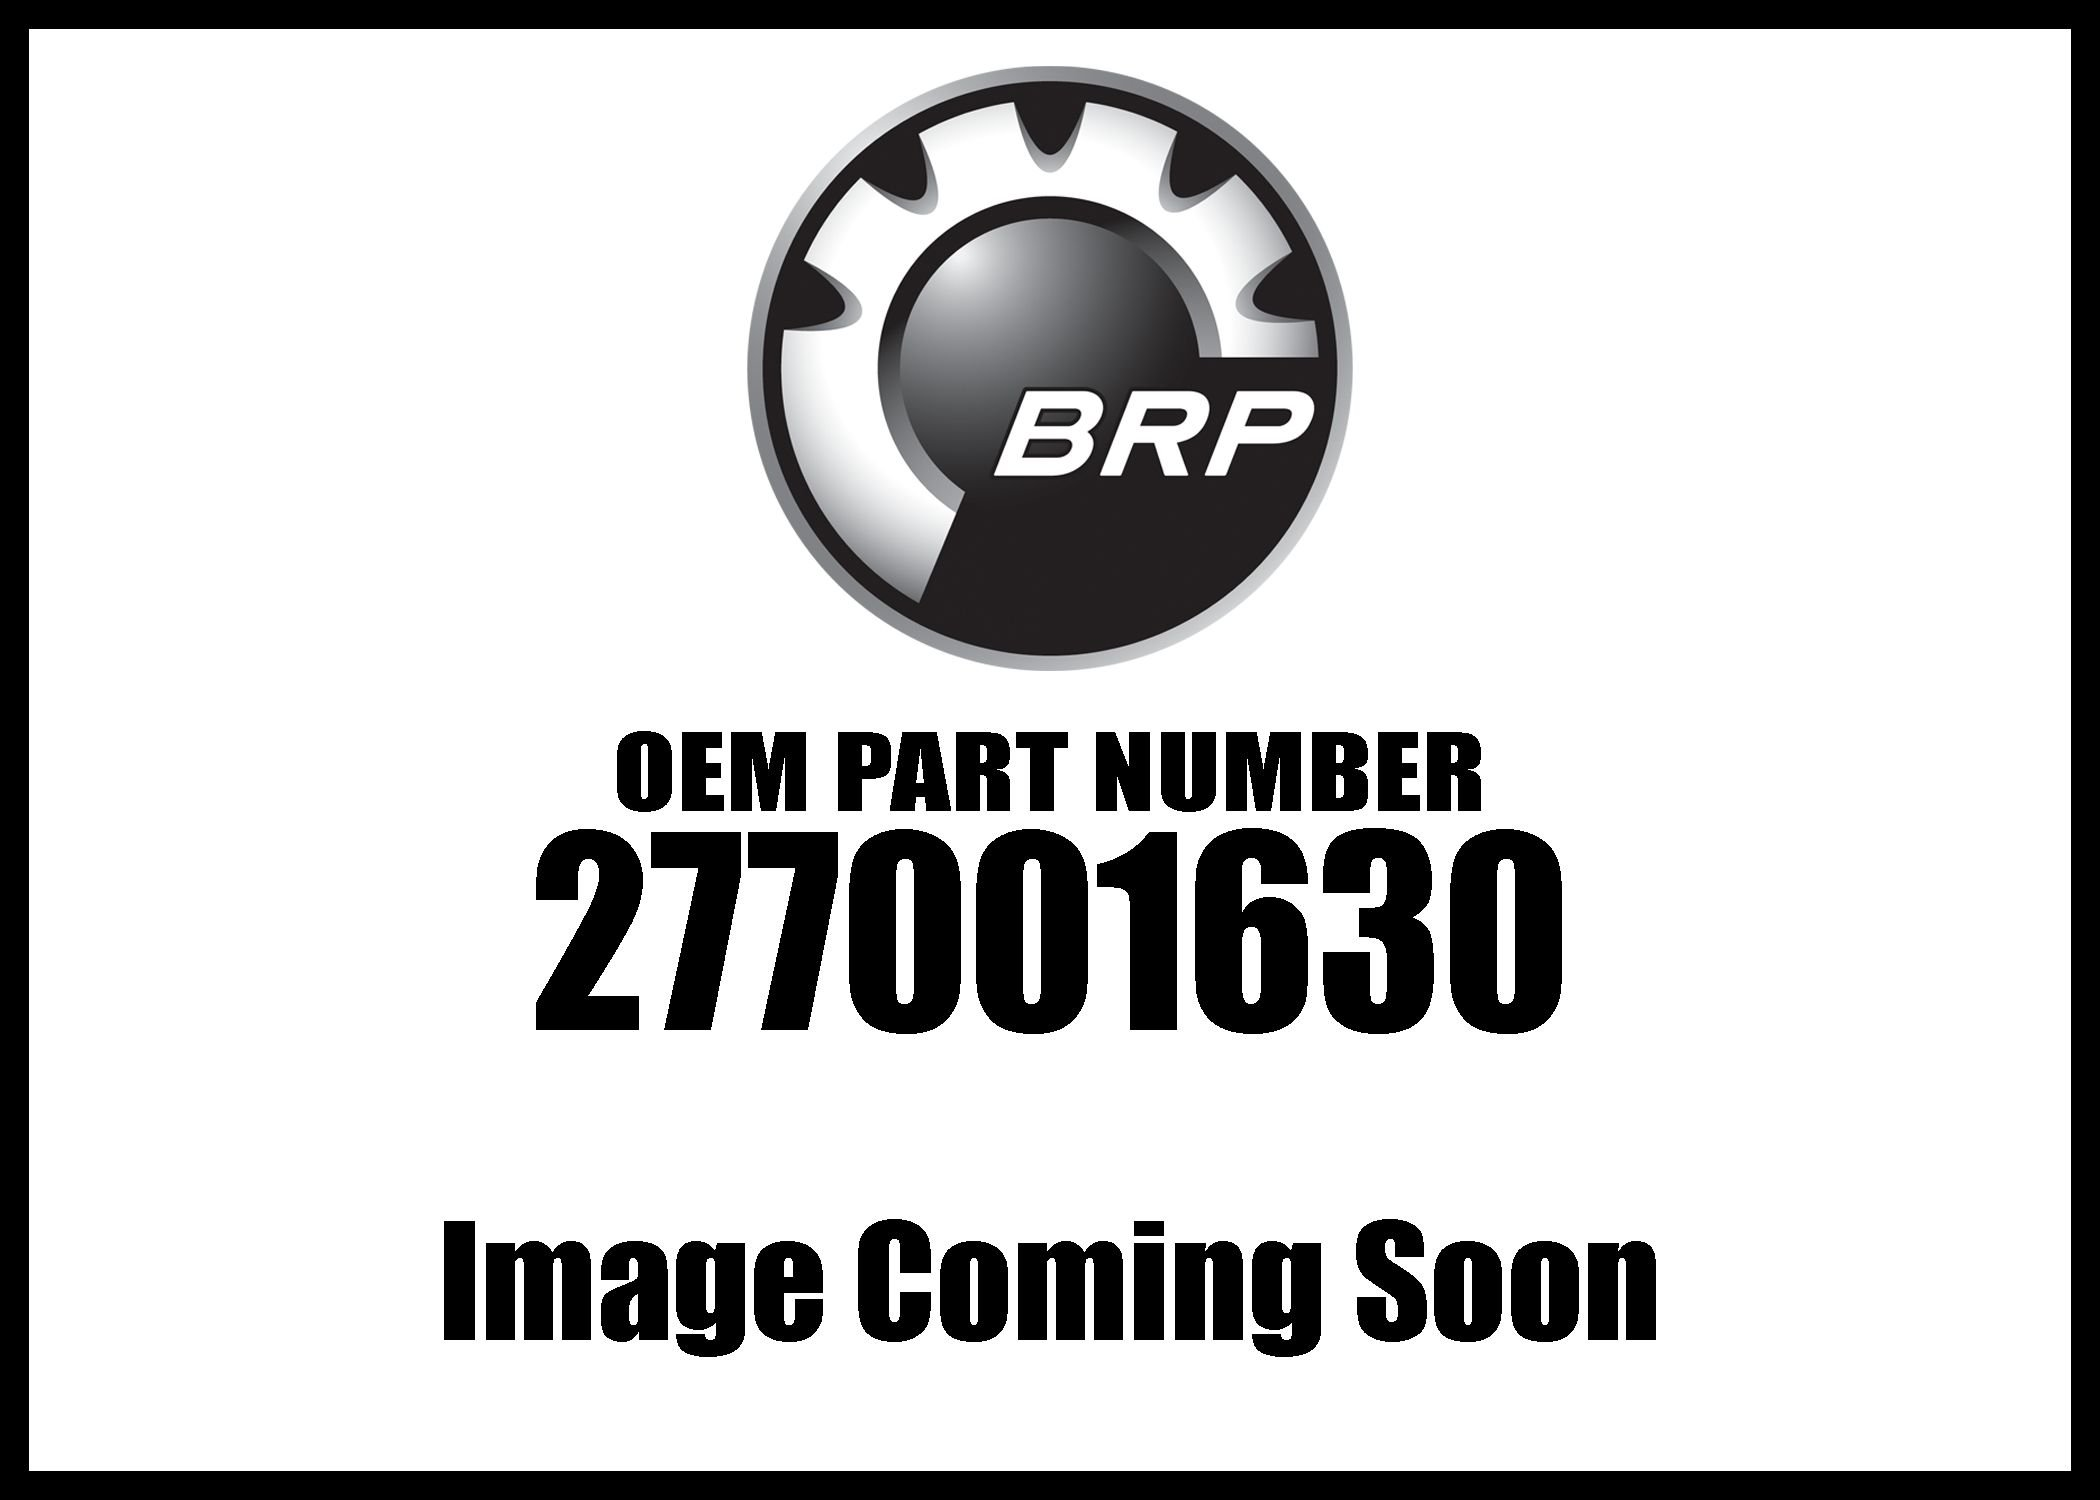 Sea-Doo 2009-2017 Wake Pro 215 Wake Pro Gauge Trim Black 277001630 New Oem by Sea-Doo